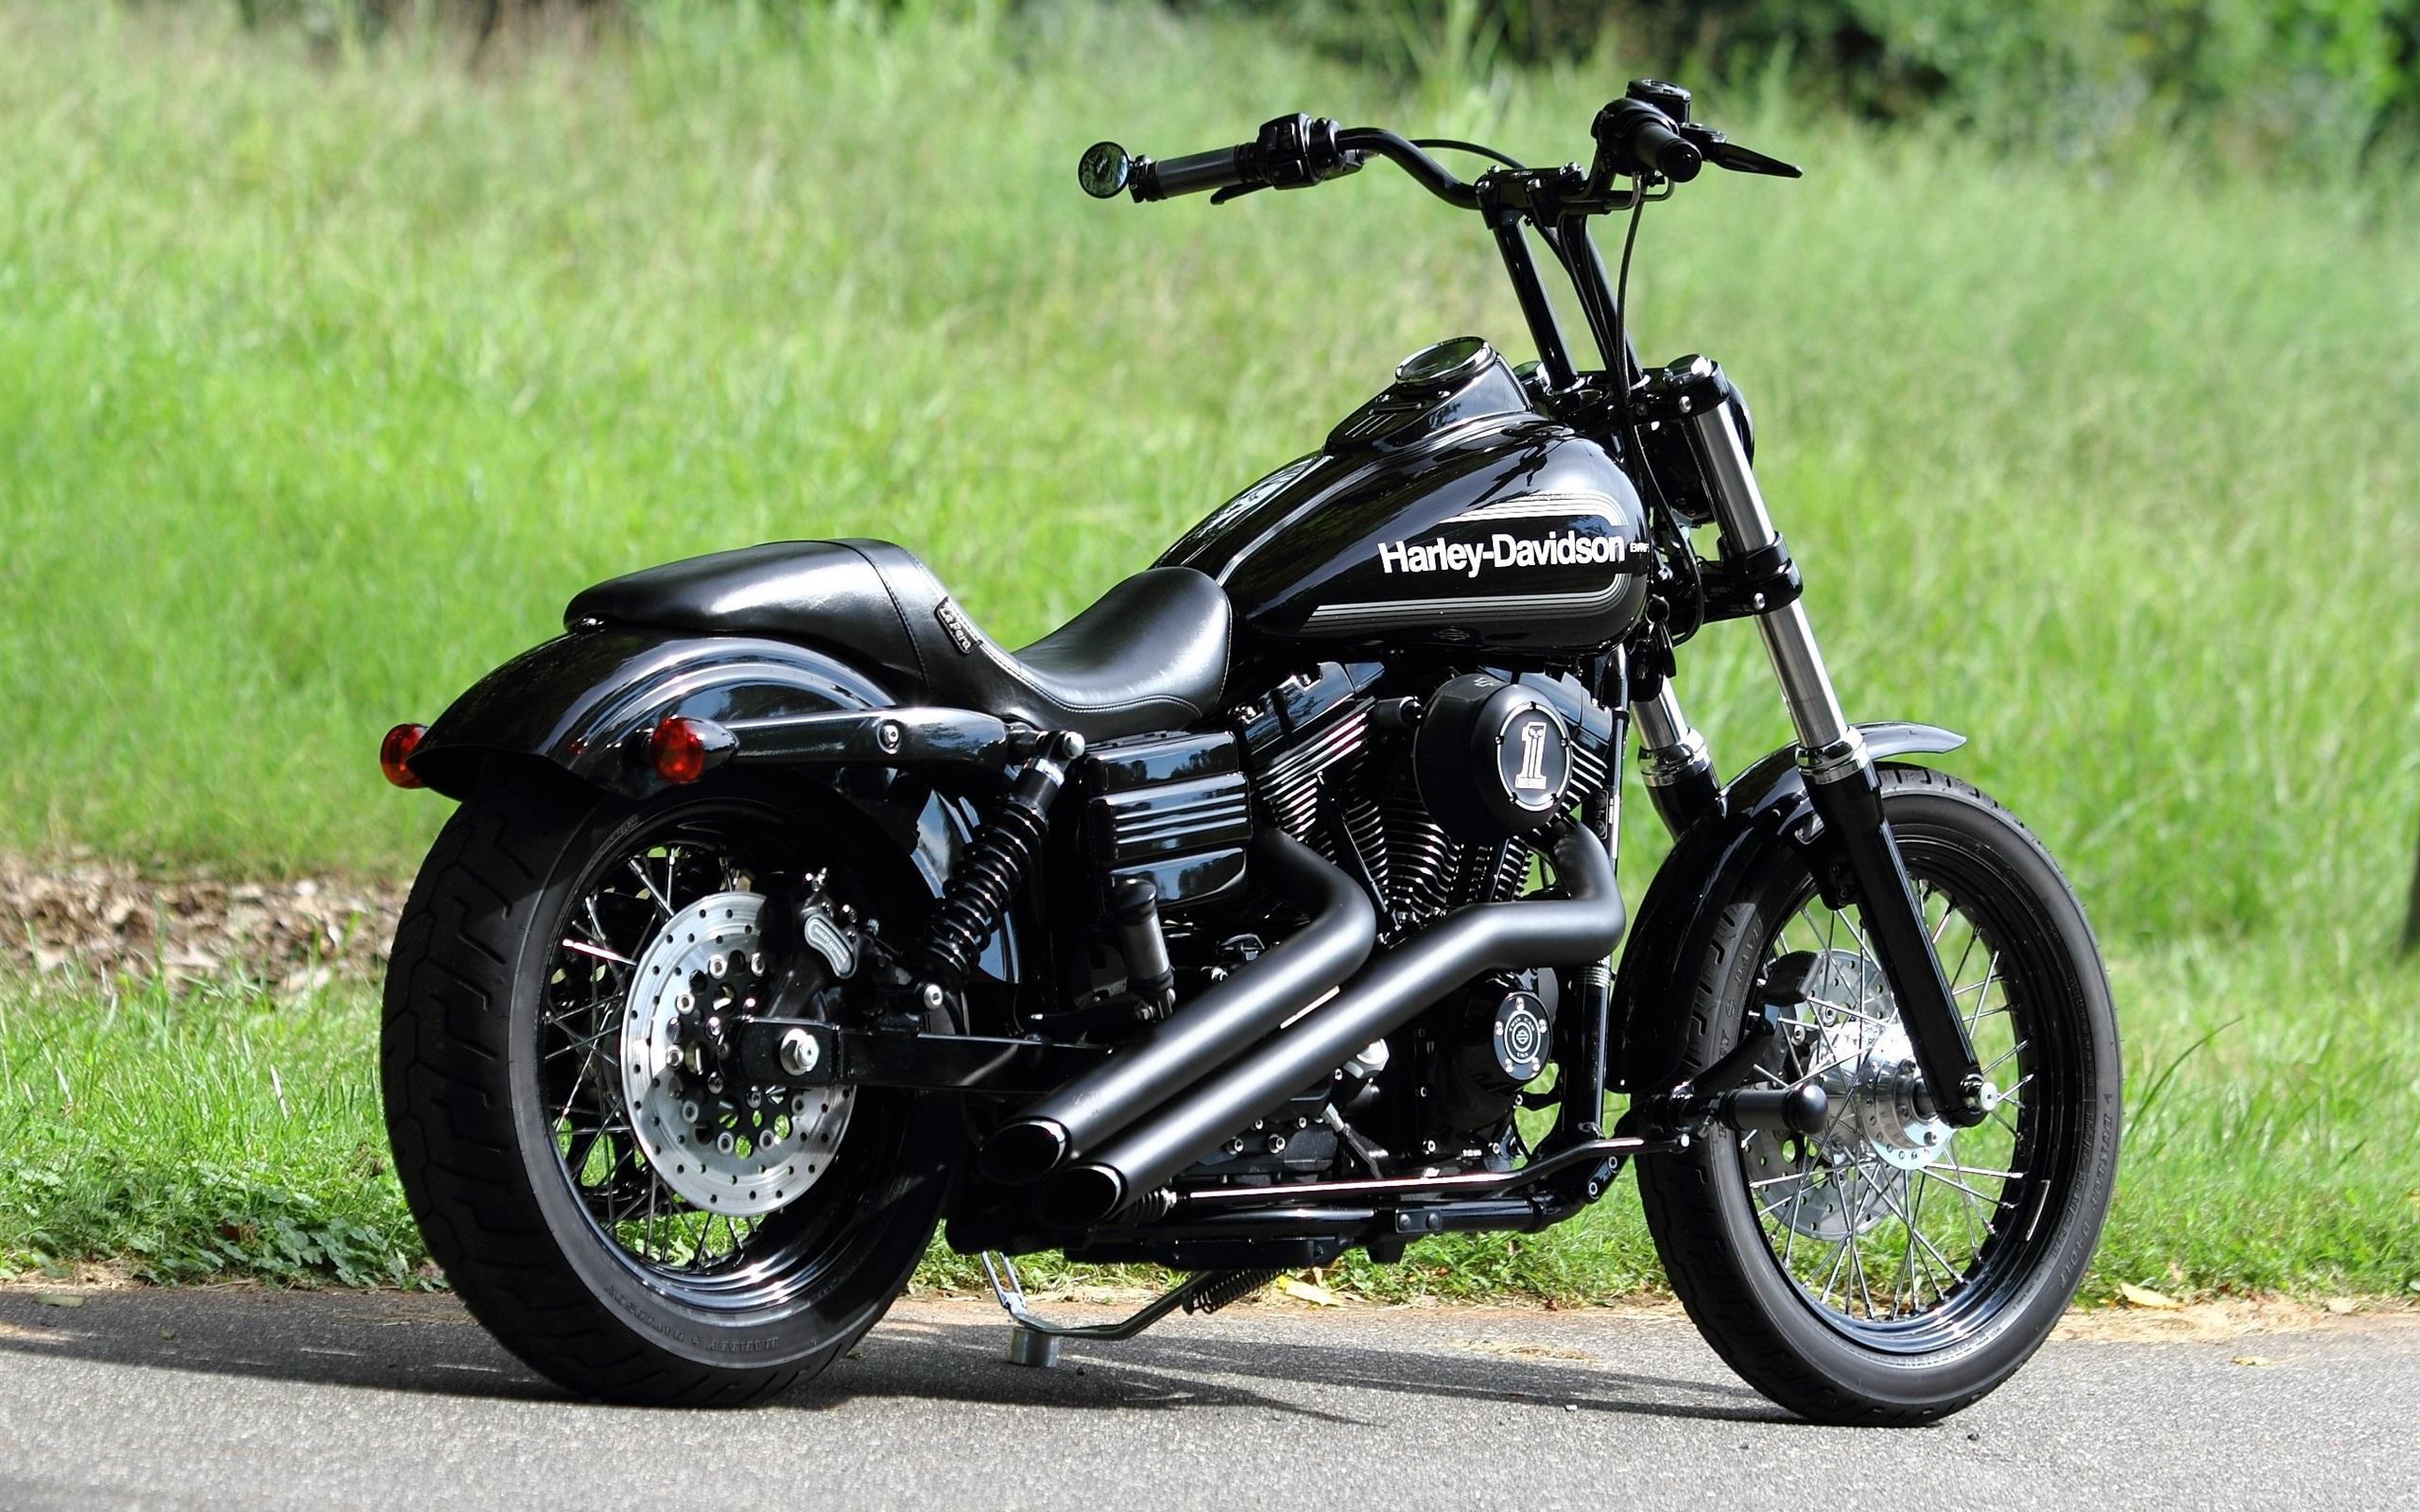 Wallpaper Harley Davidson Chopper Black Motorcycle 2560x1600 HD